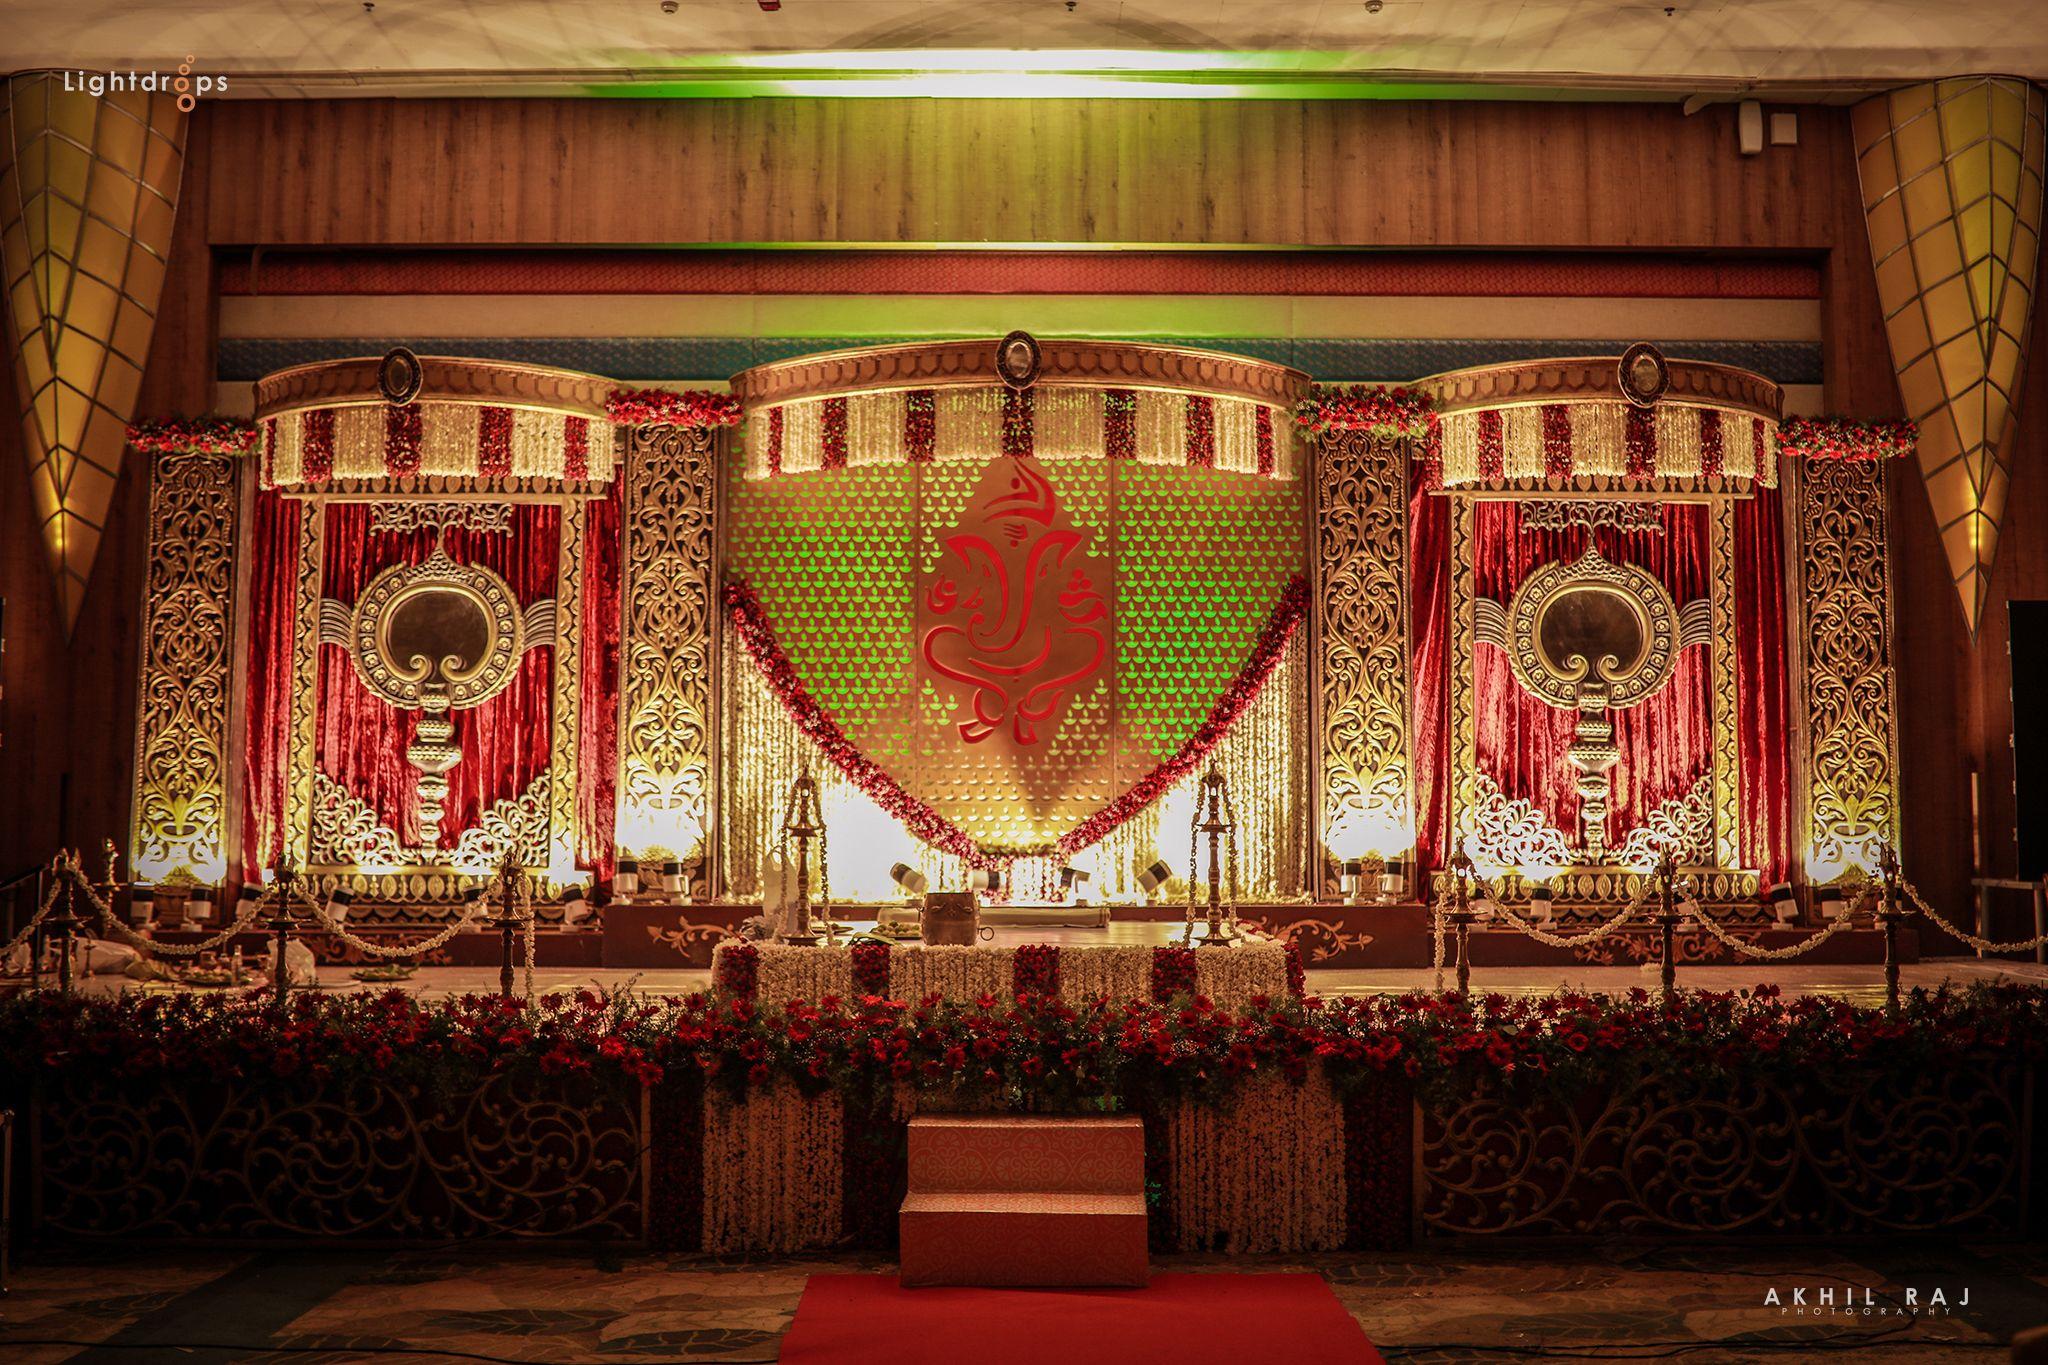 Wedding decoration ideas kerala  Pin by kishore gdas on Kerala traditional wedding decor  Pinterest